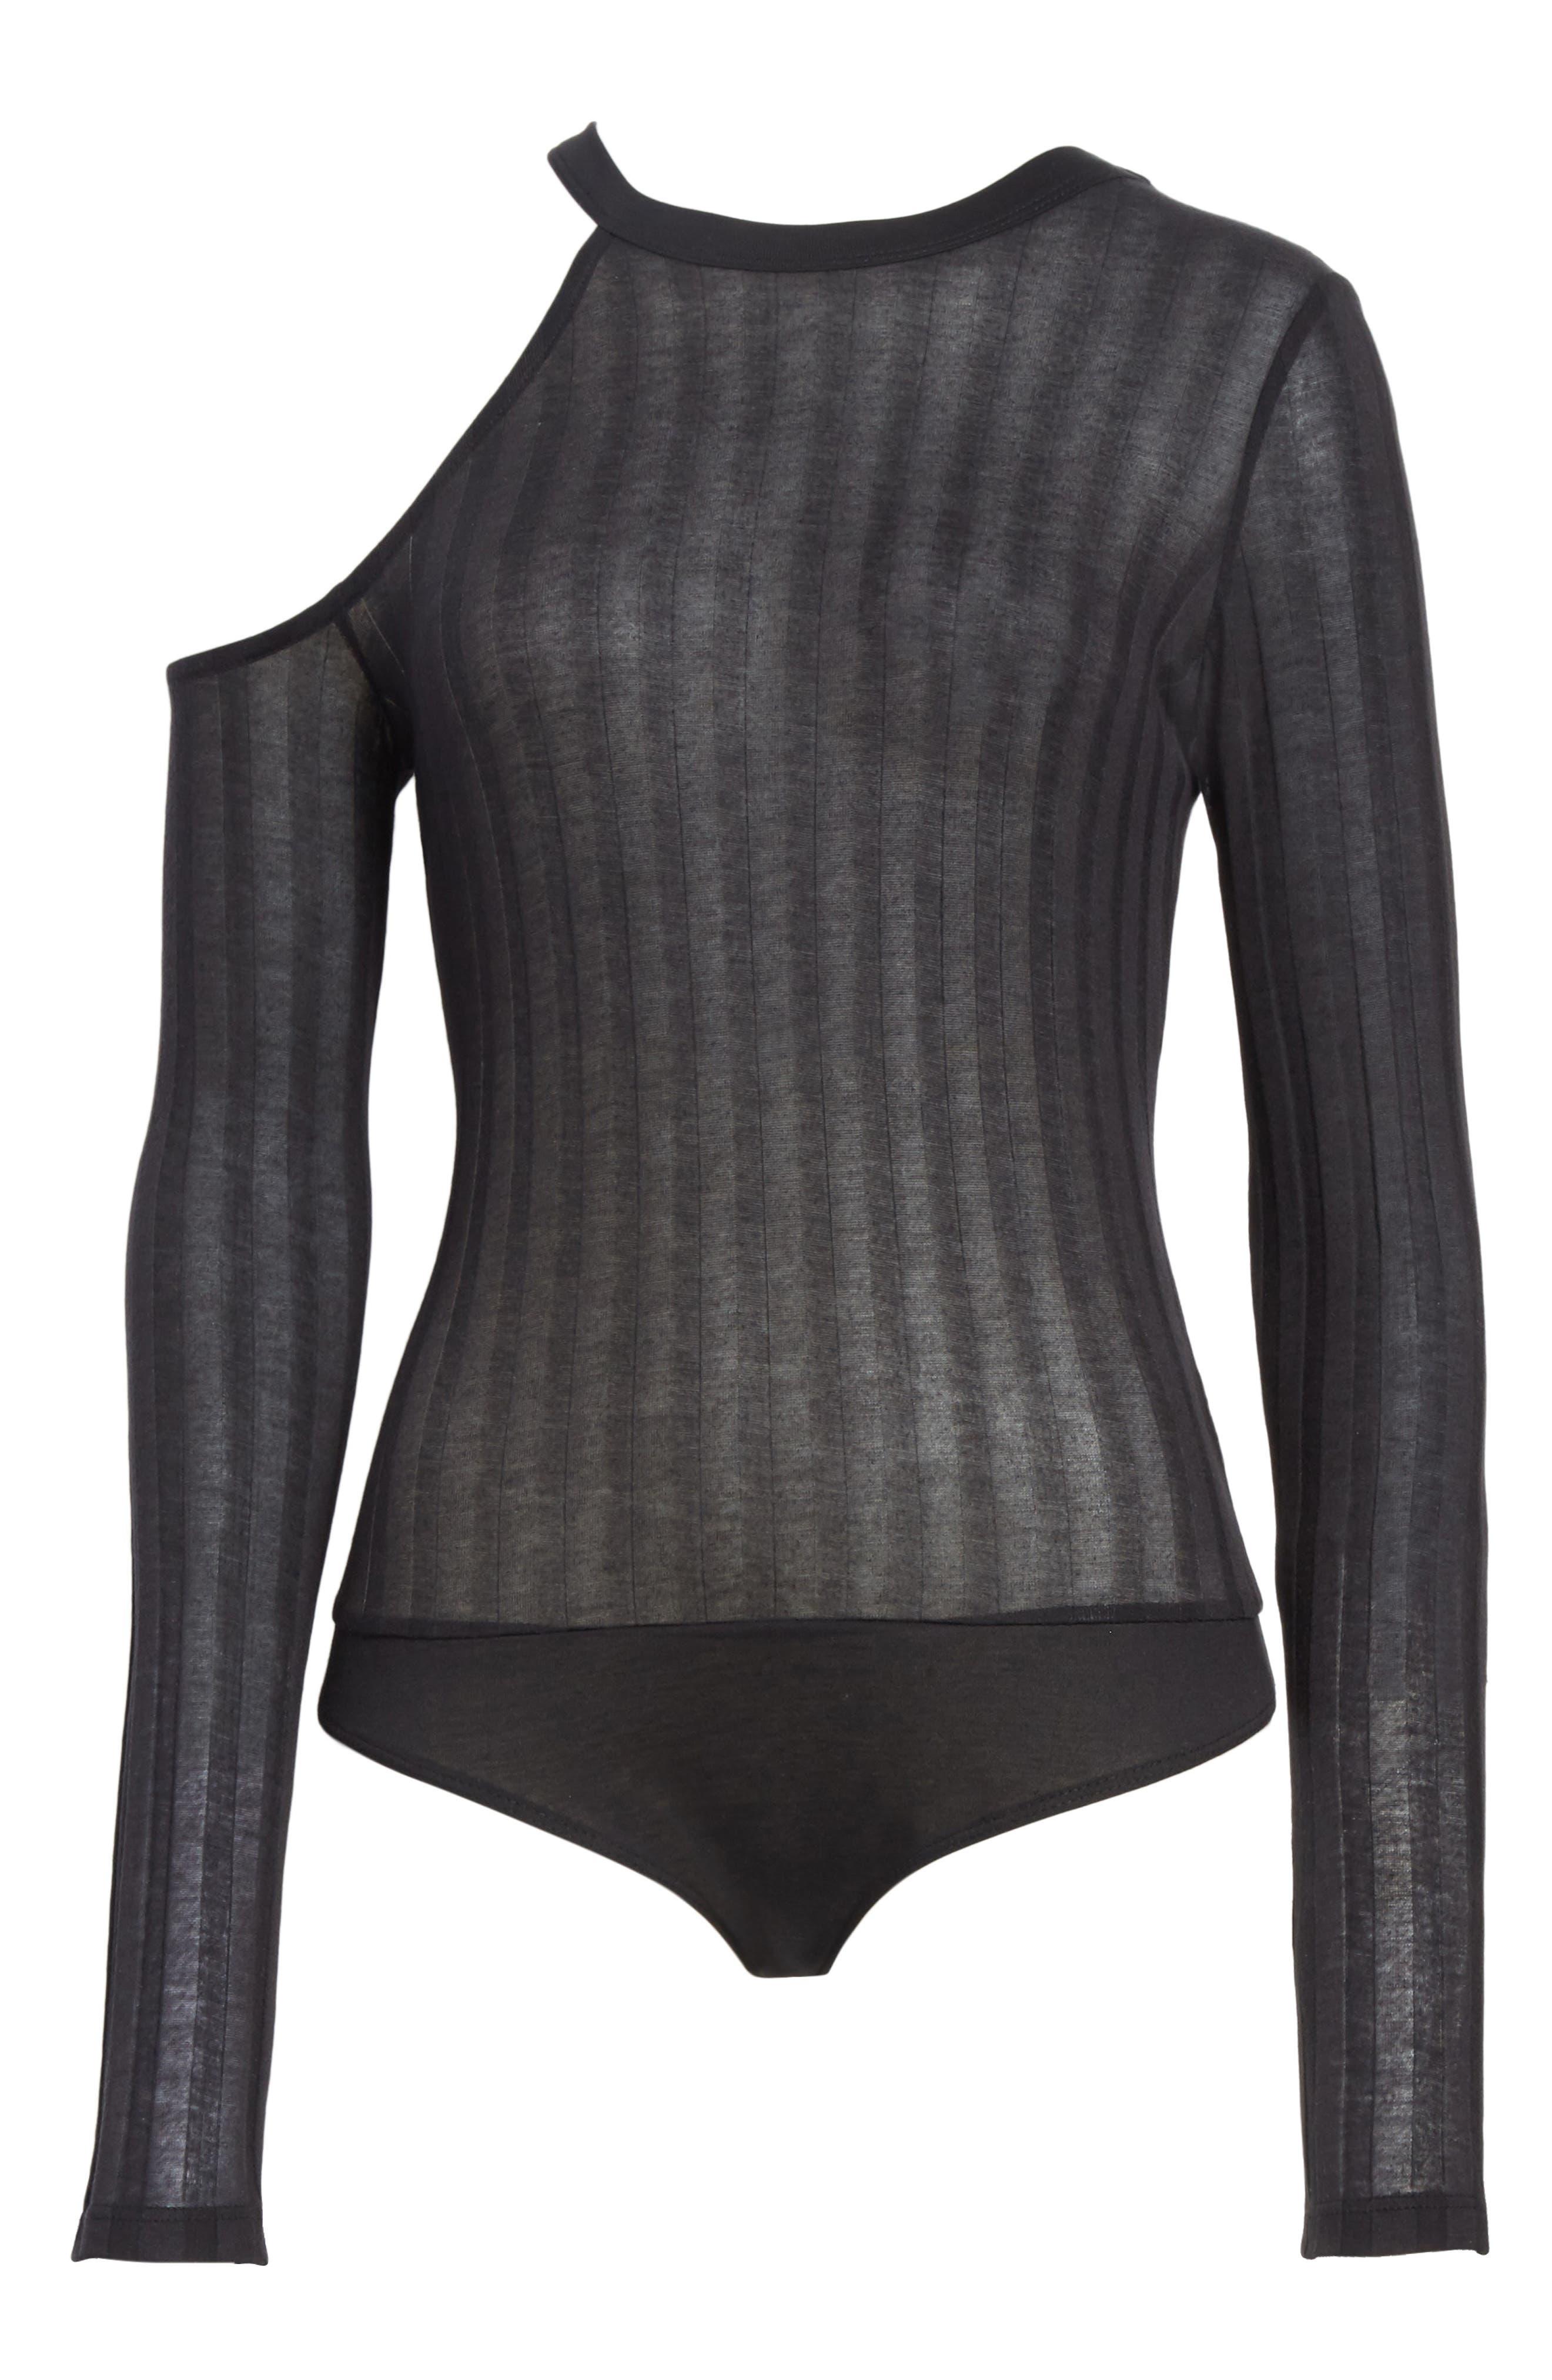 Lookout One-Shoulder Jersey Bodysuit,                             Alternate thumbnail 6, color,